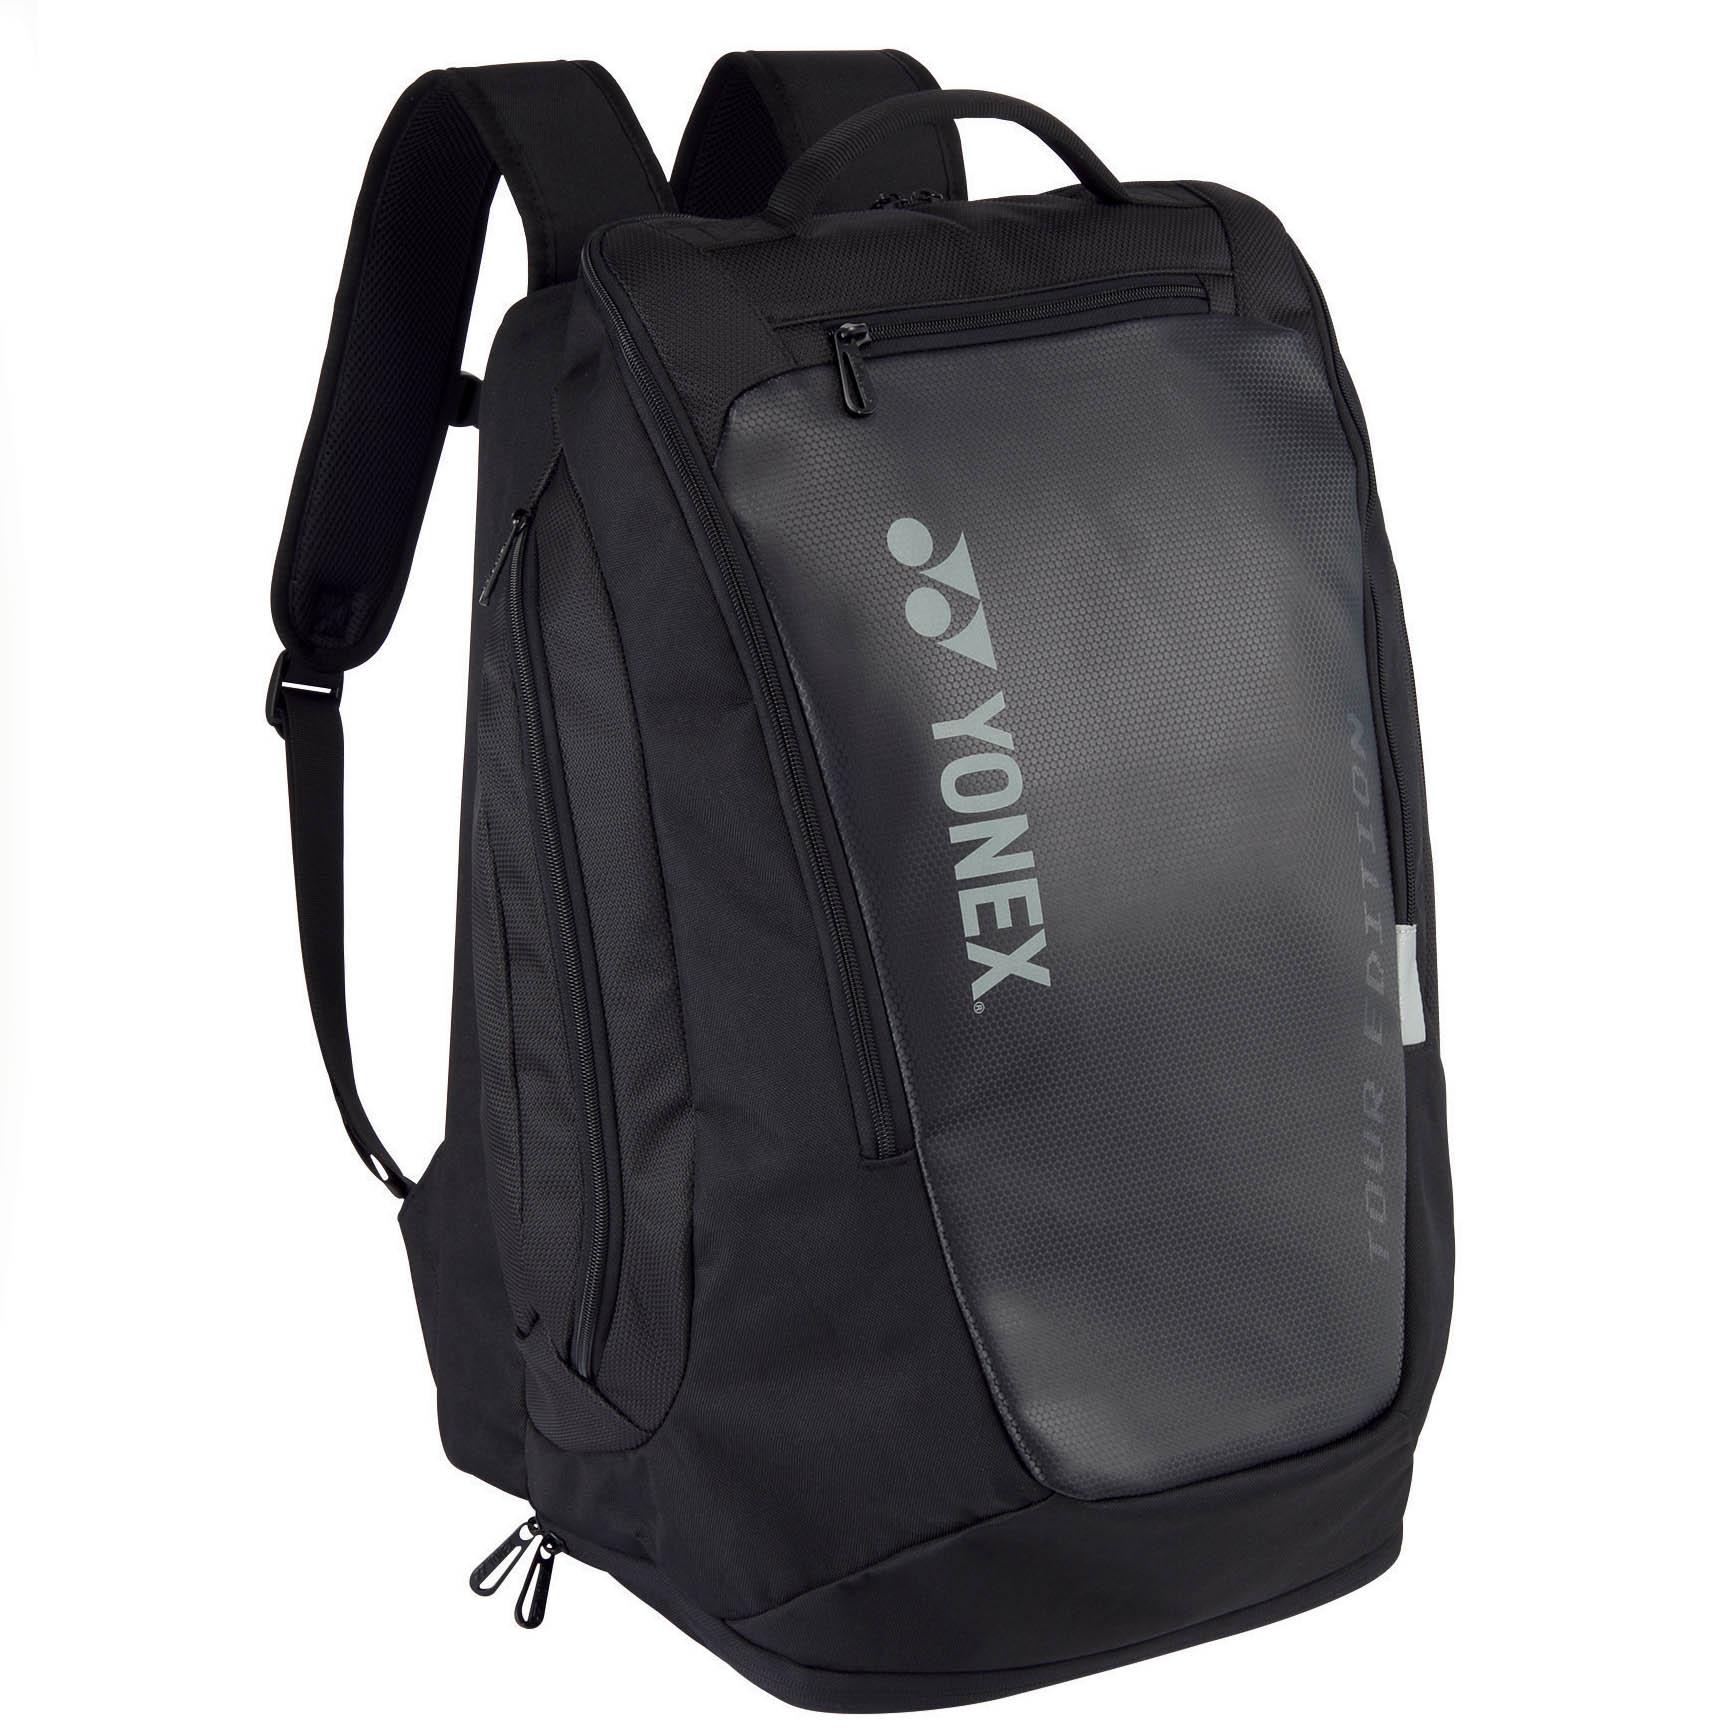 Yonex 92012 Pro Backpack - Black